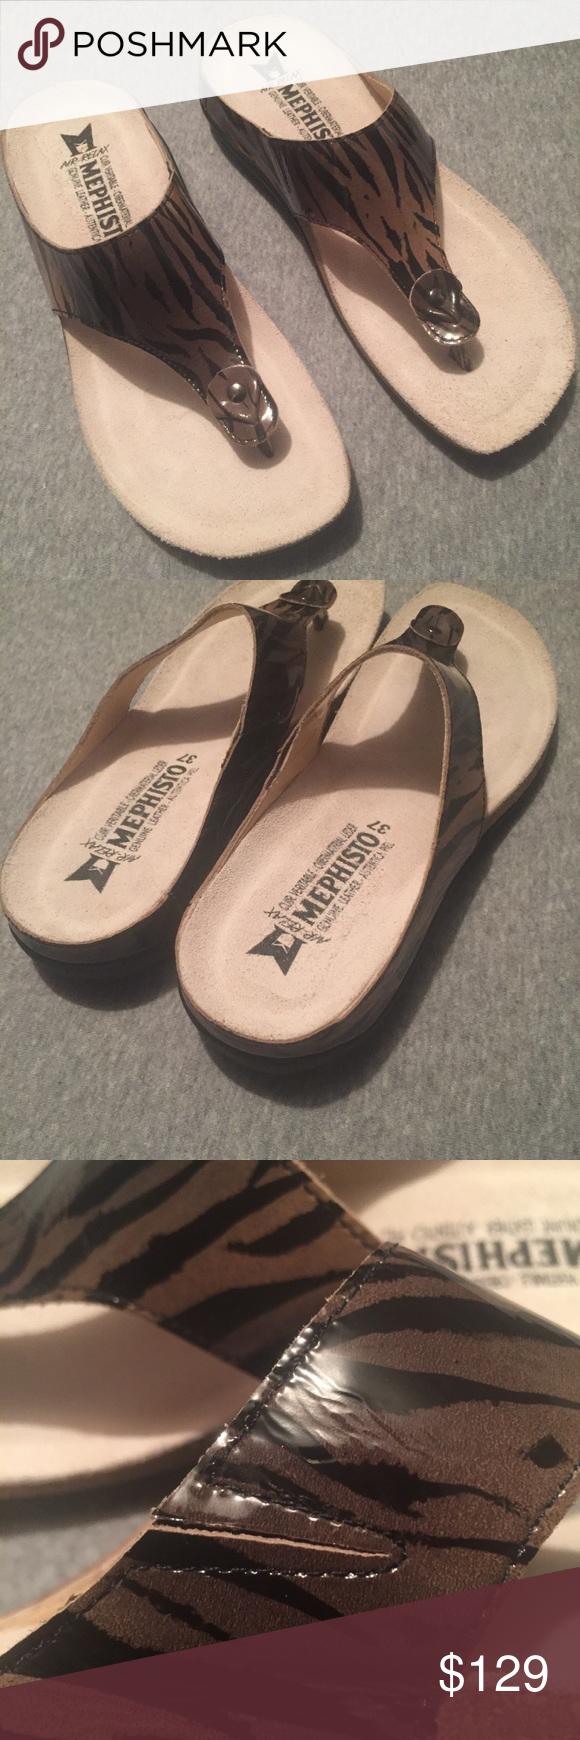 Women's Mephisto Tiger Print Patent Sandals Sz 37 Patent